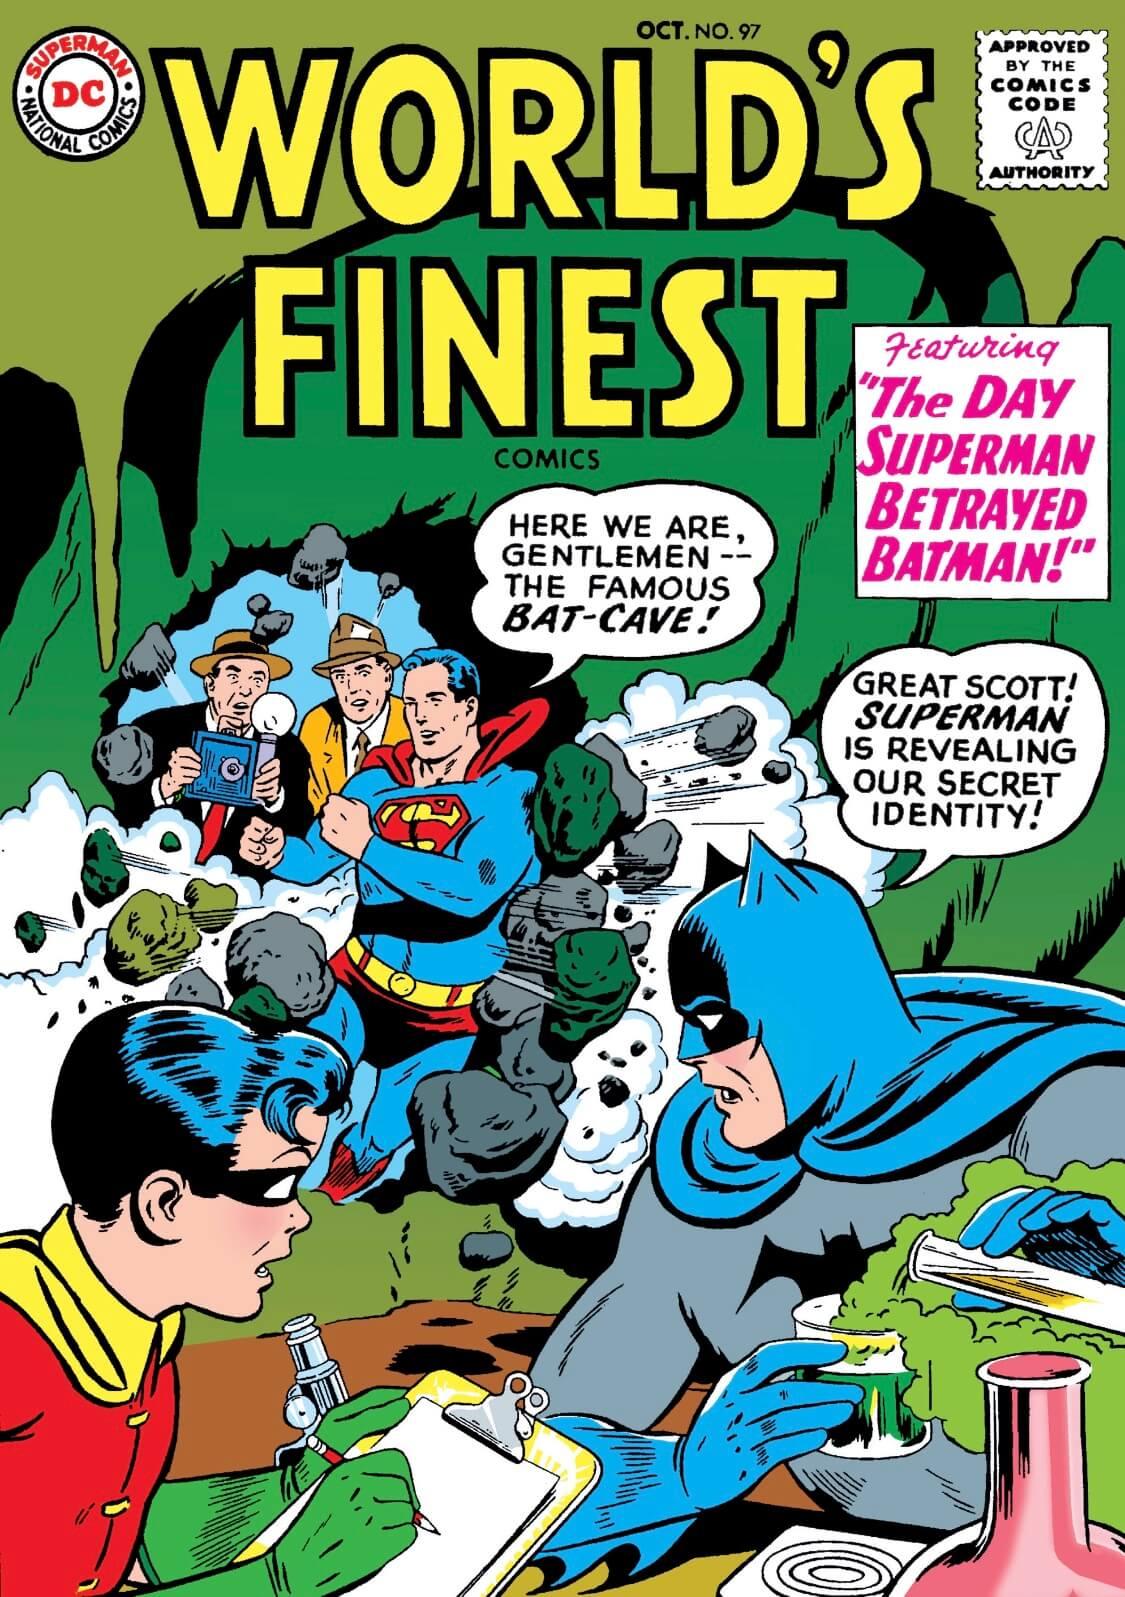 superman-batman-silver-age.jpg